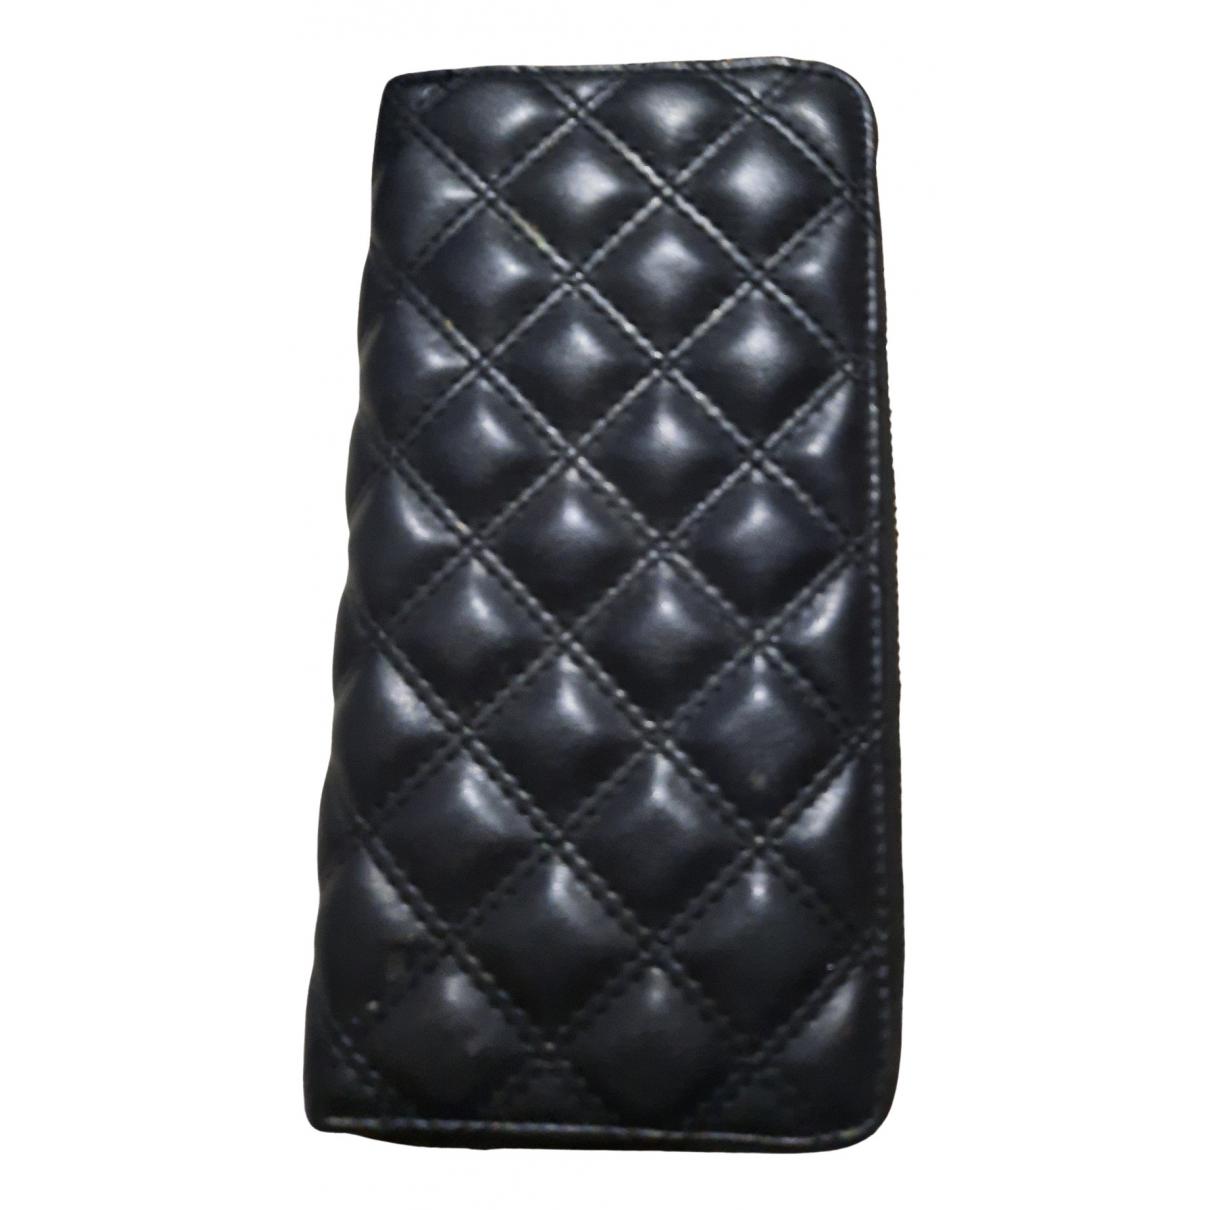 H&m Studio \N Handtasche in  Schwarz Leder